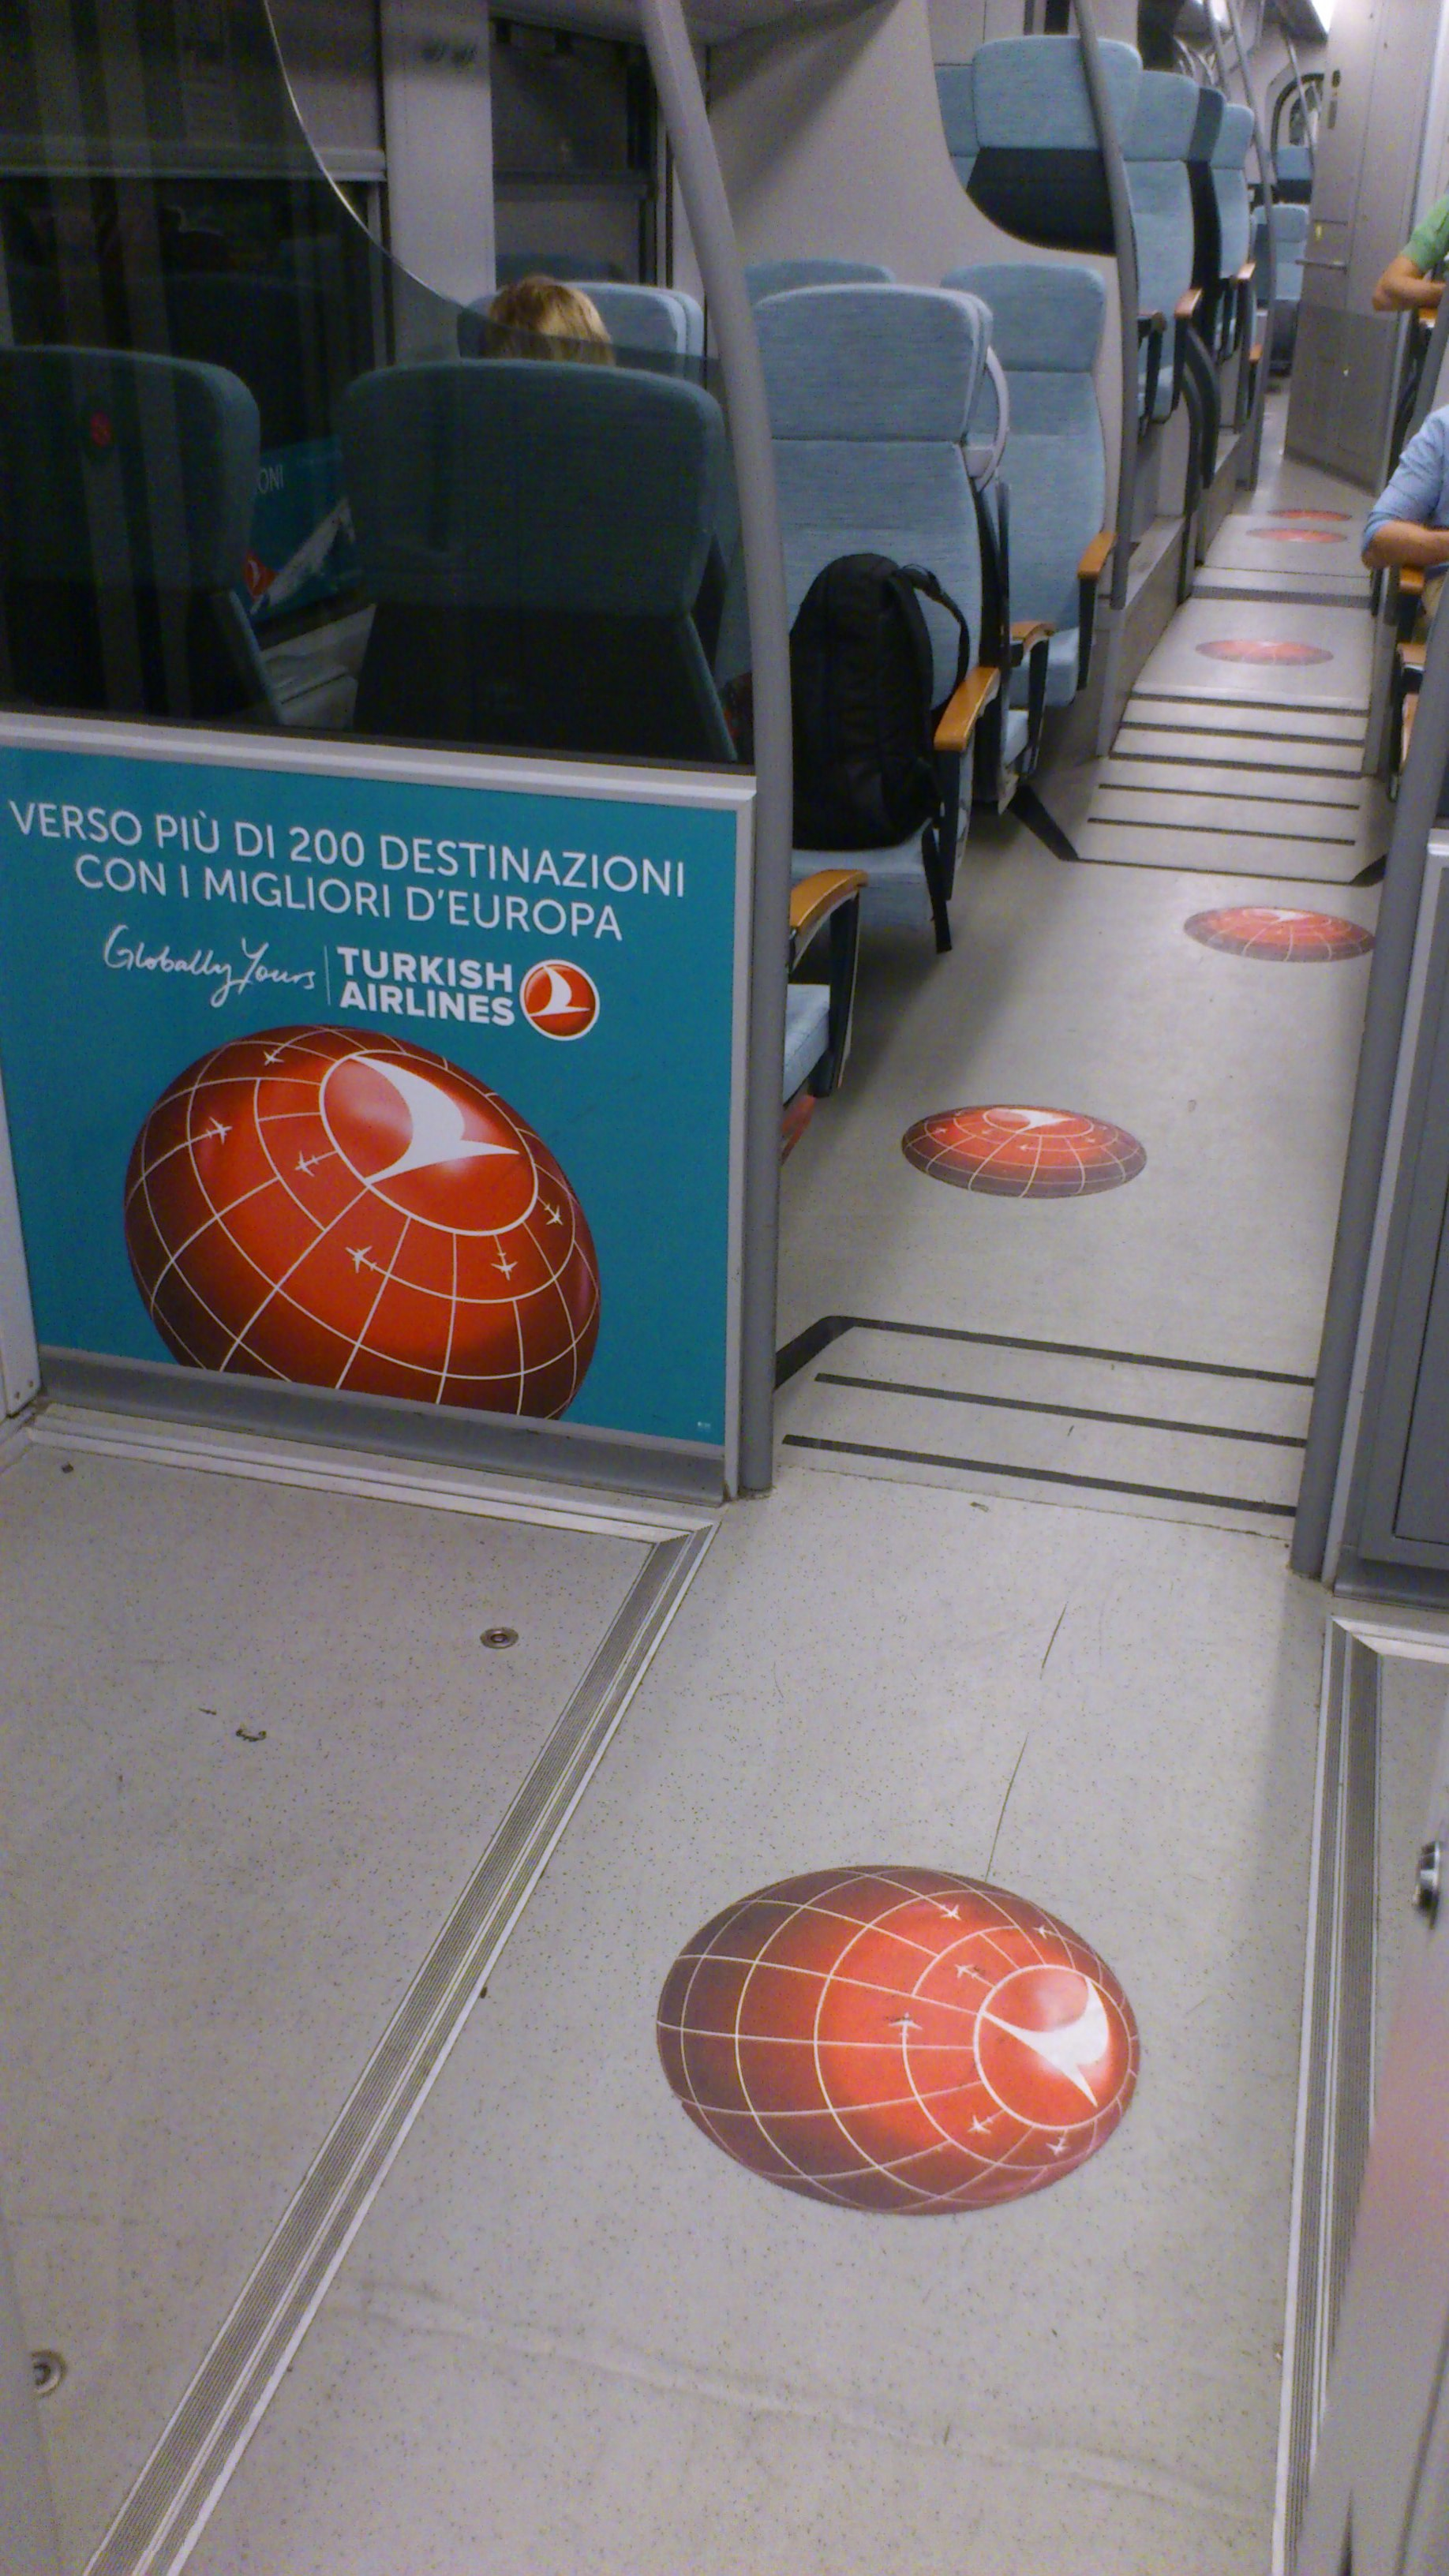 Turkish_Airlines_Milano_reklam